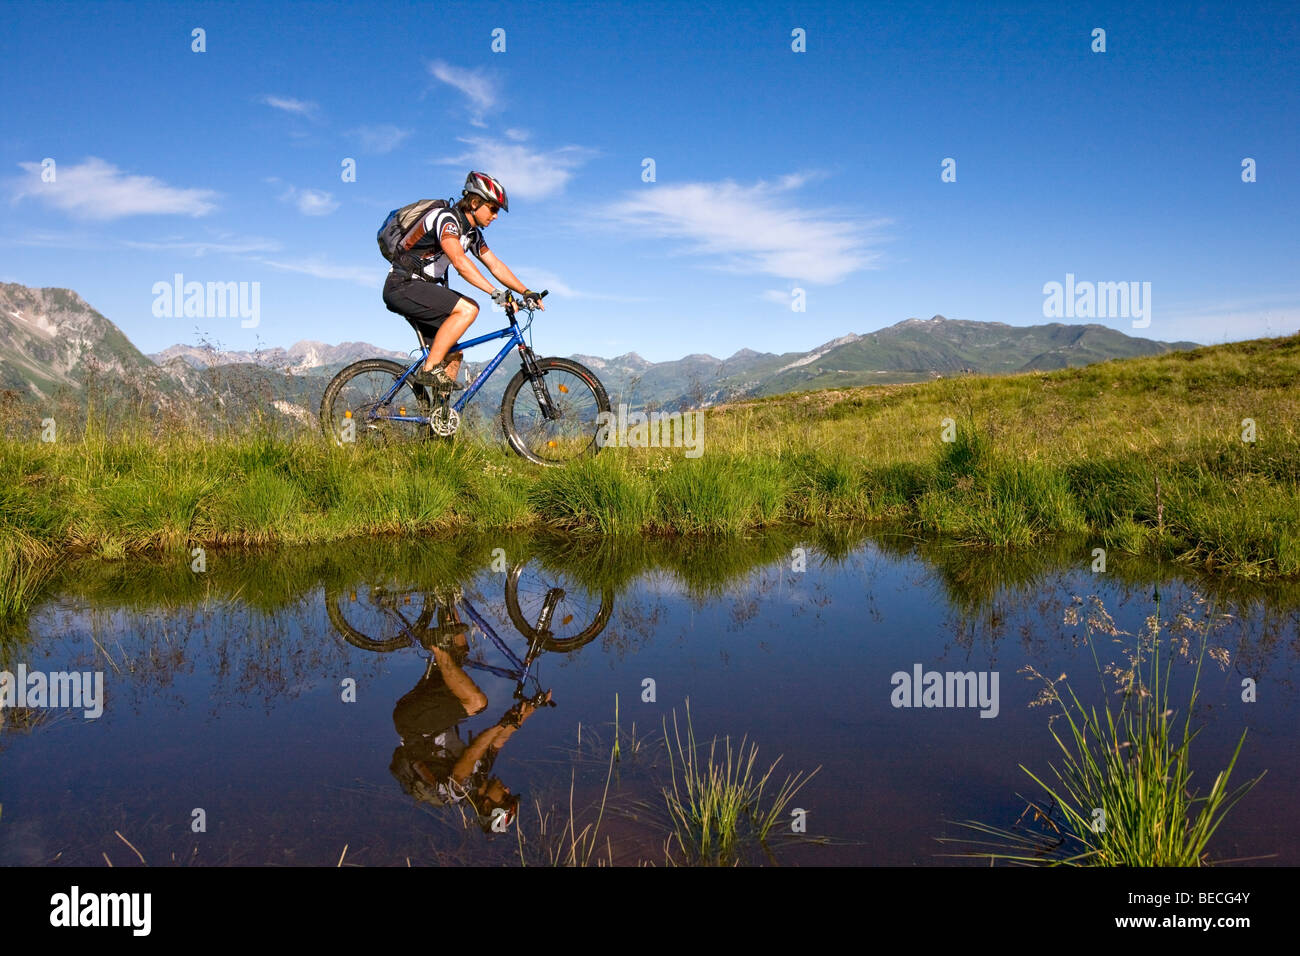 Mountainbiker on the shore of a mountain lake, Northern Tyrol, Austria, Europe Stock Photo